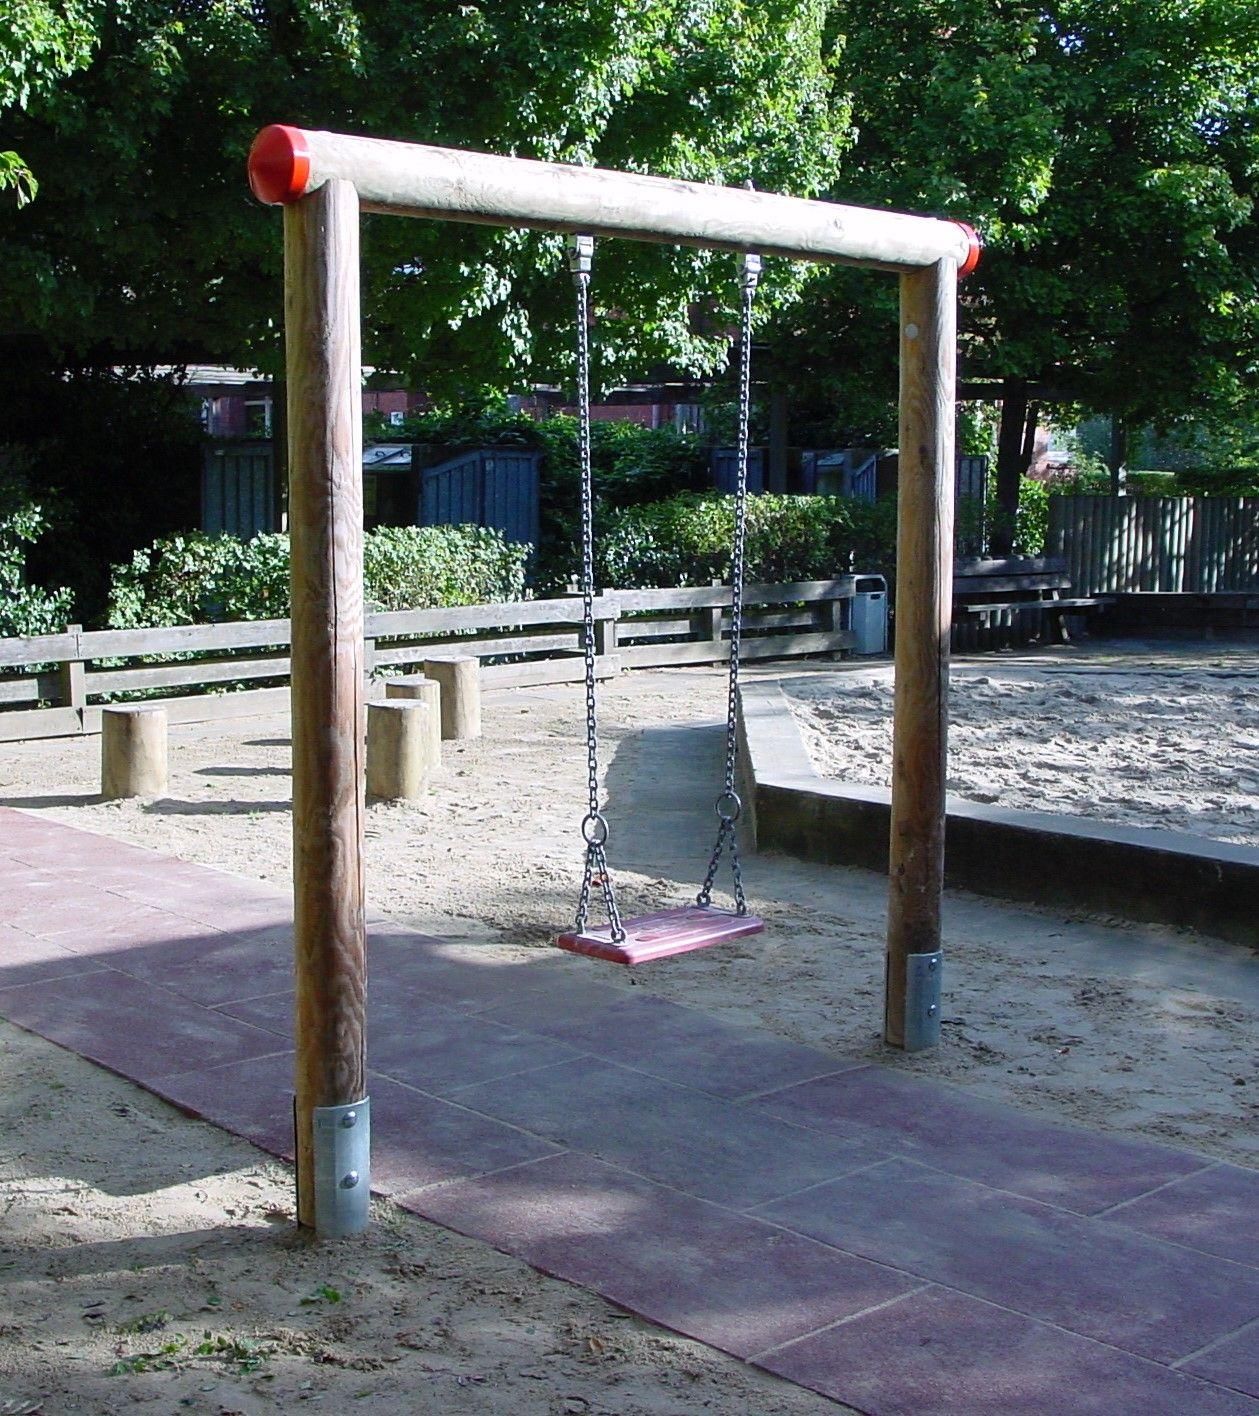 Nestschaukel Kinderschaukel Rundschaukel Kinder Garten Schaukel ø Ca